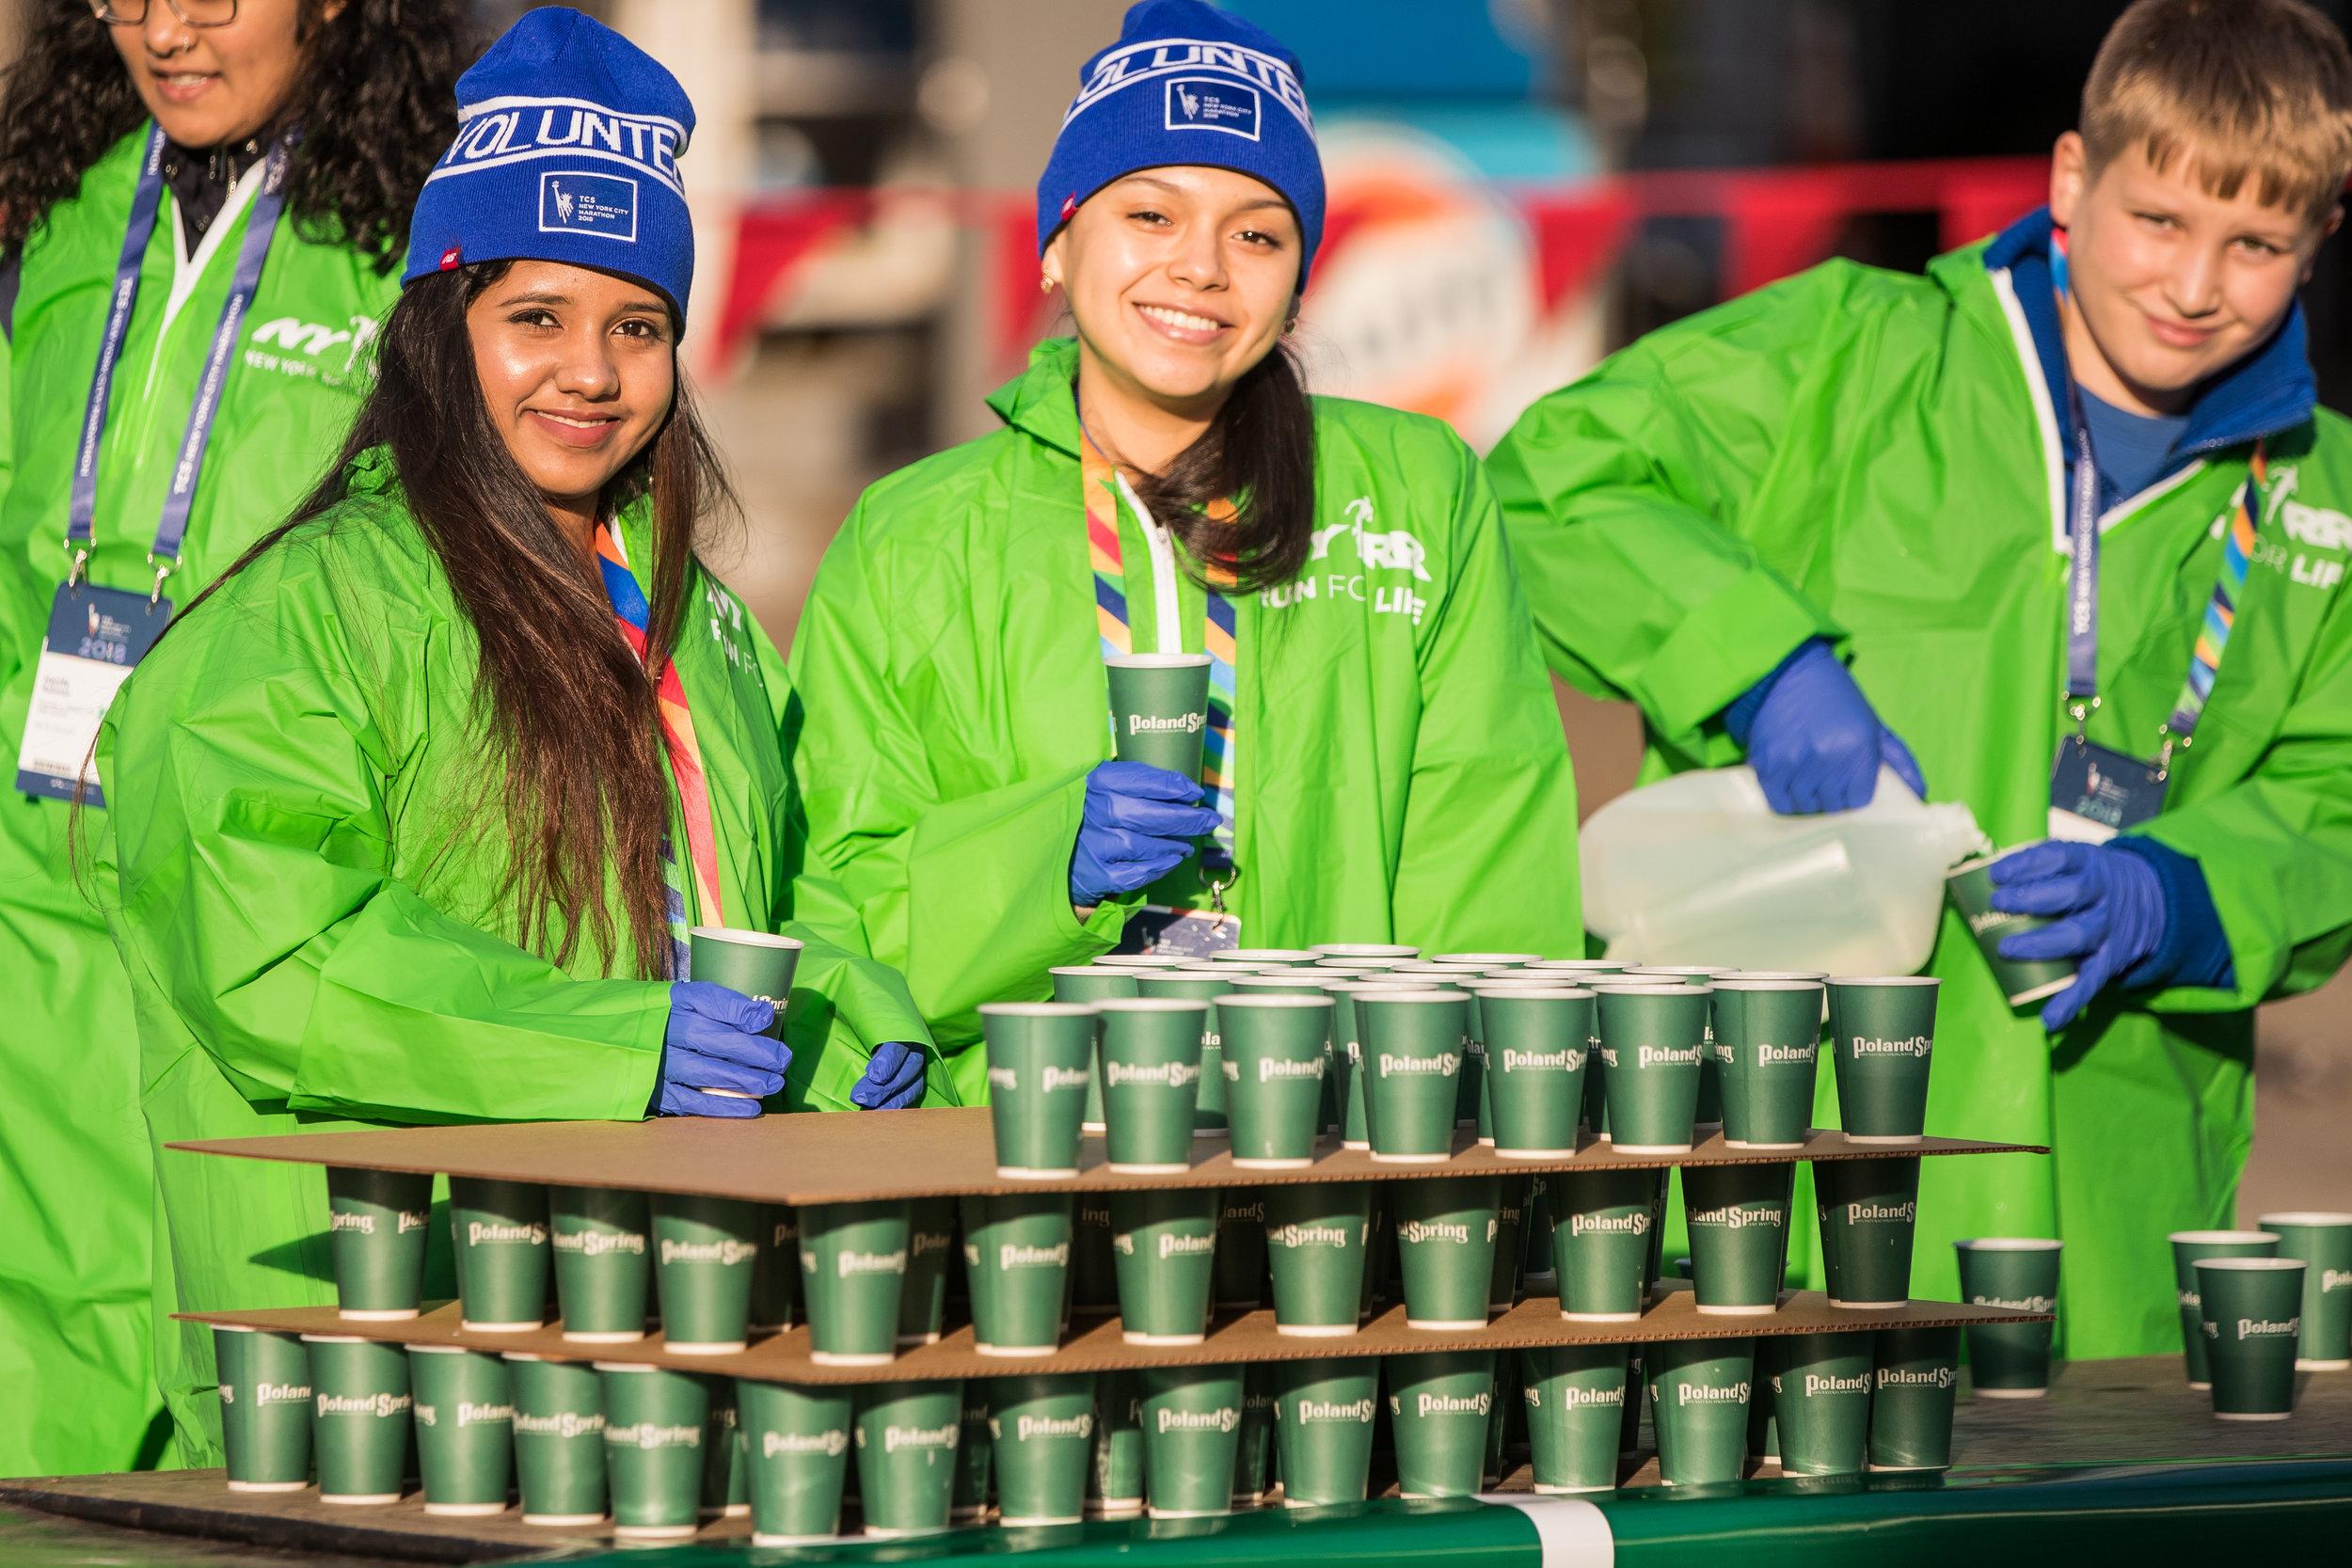 New York City Marathon volunteers at an aid station